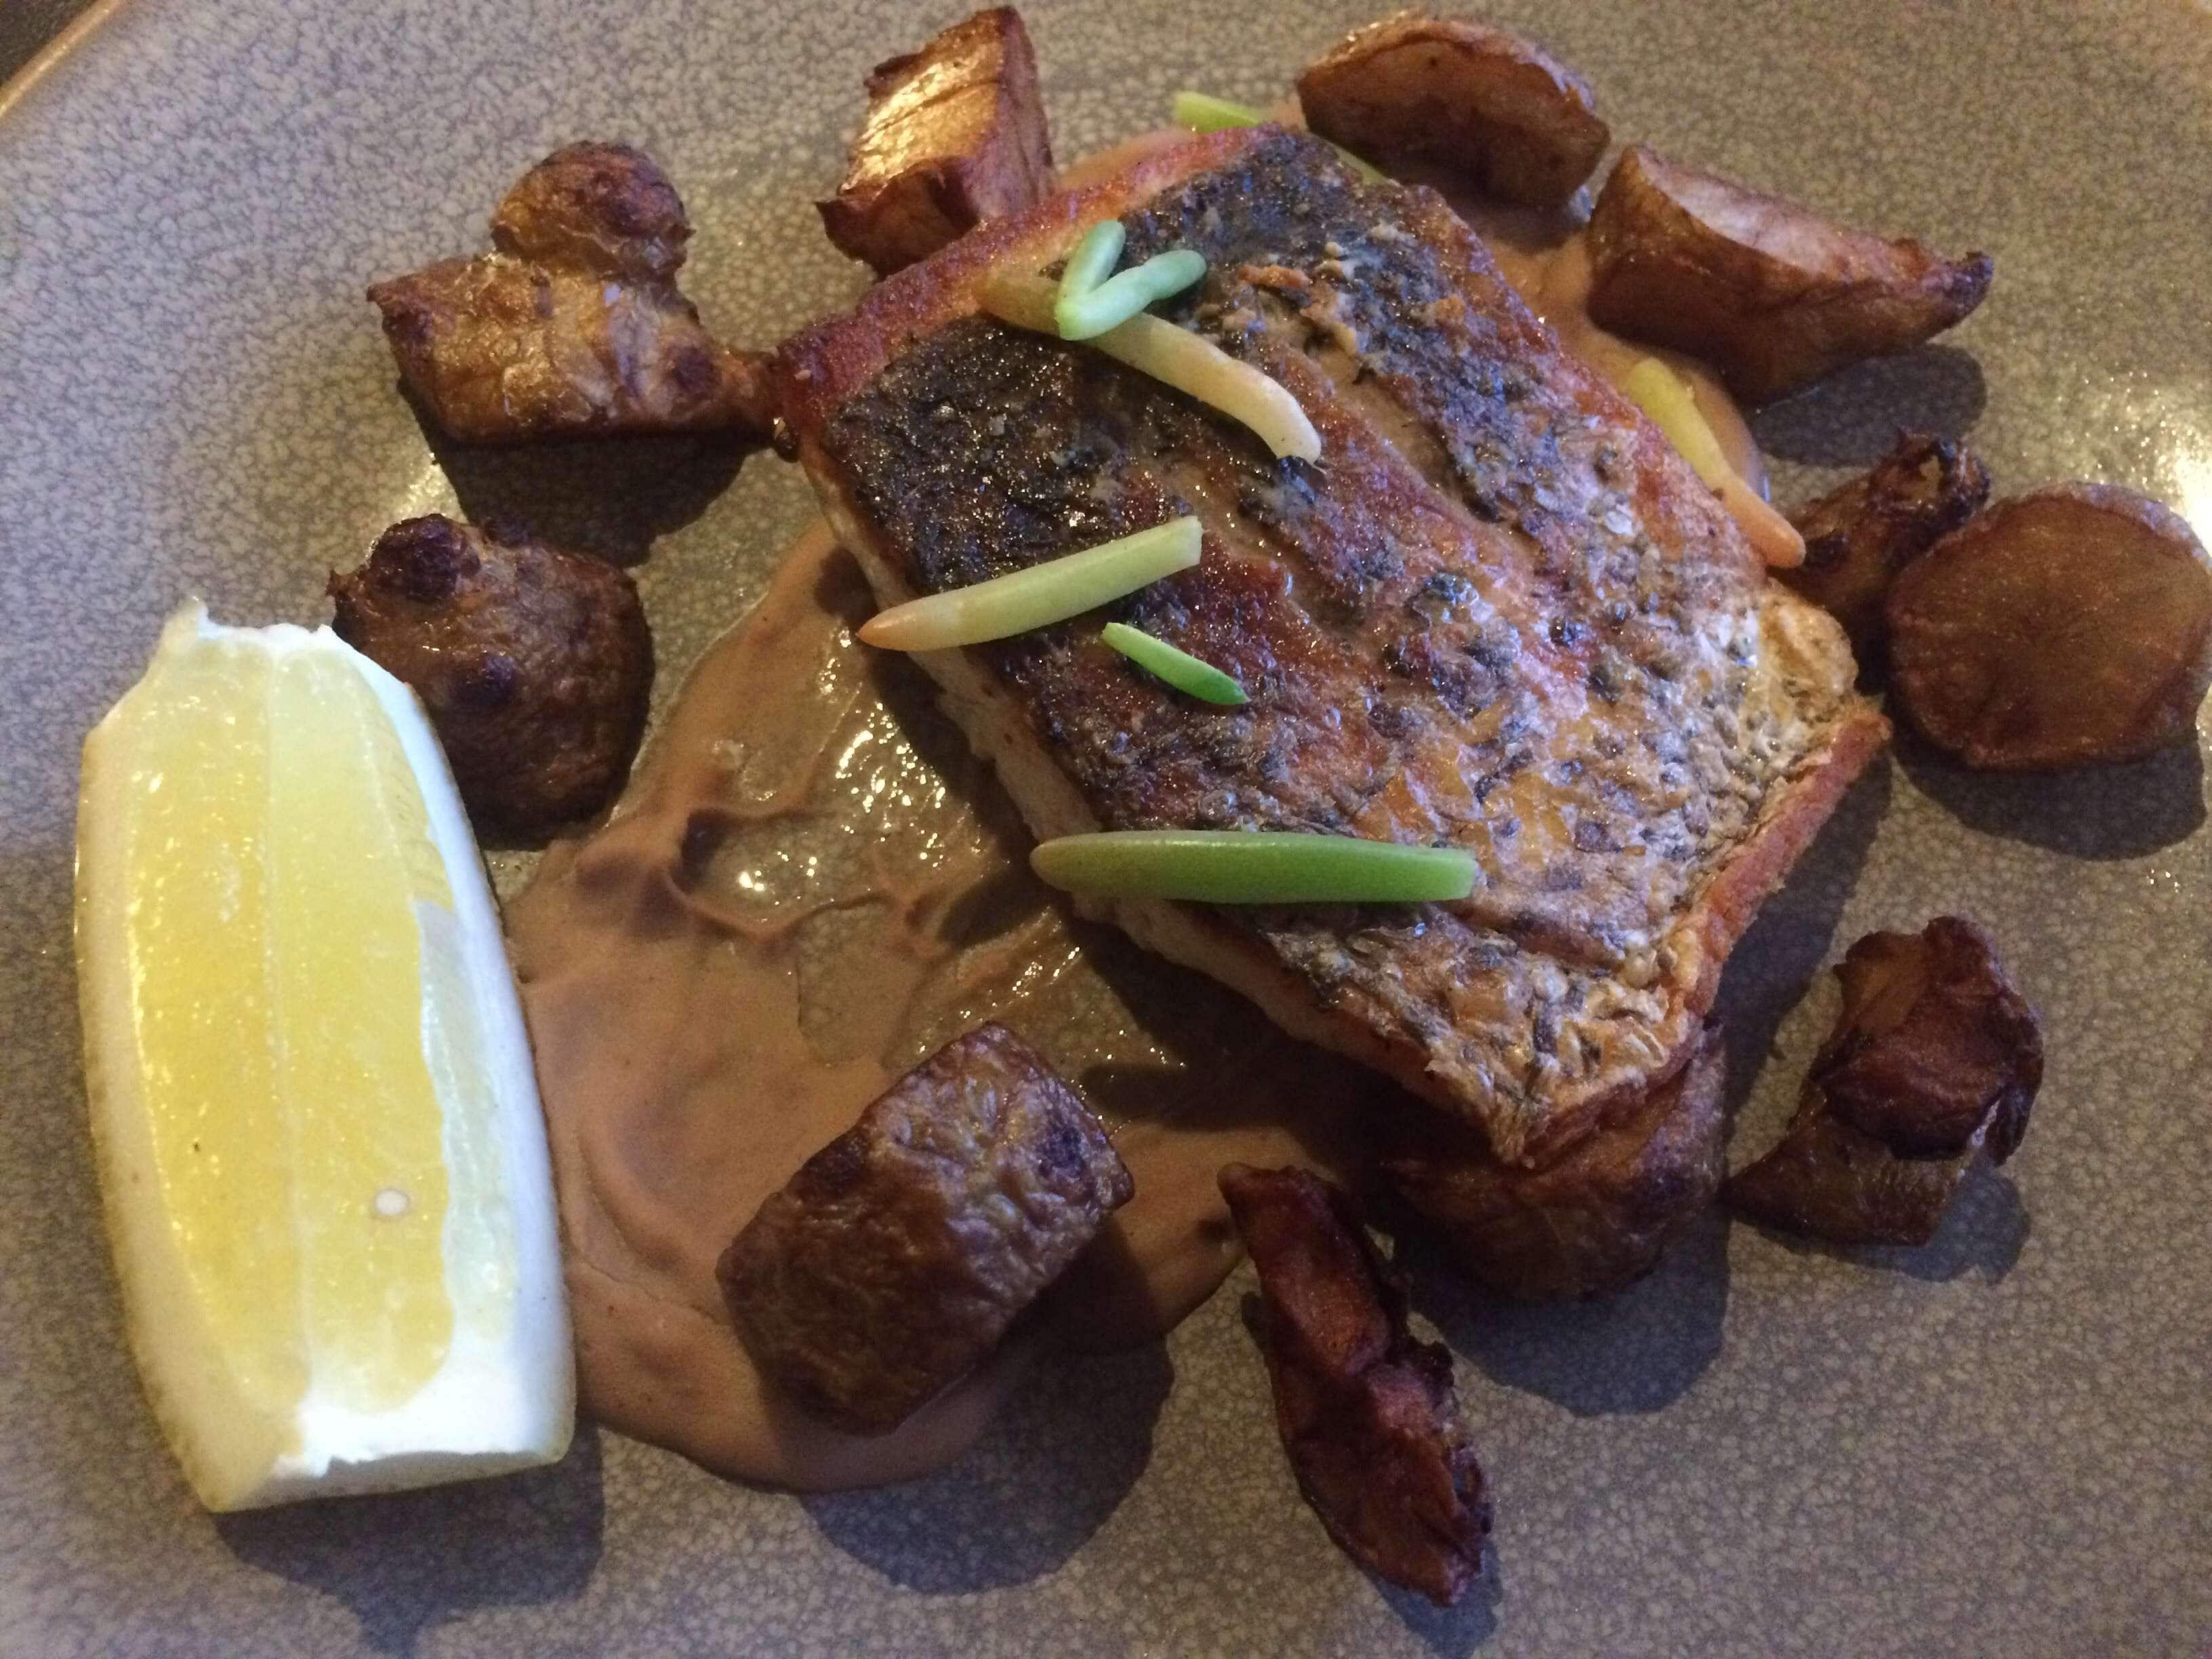 Clarendon Street Grill - Crowne Plaza Hotel   1-5 Spencer Street, Docklands, Victoria 3008   +61 3 9648 2756